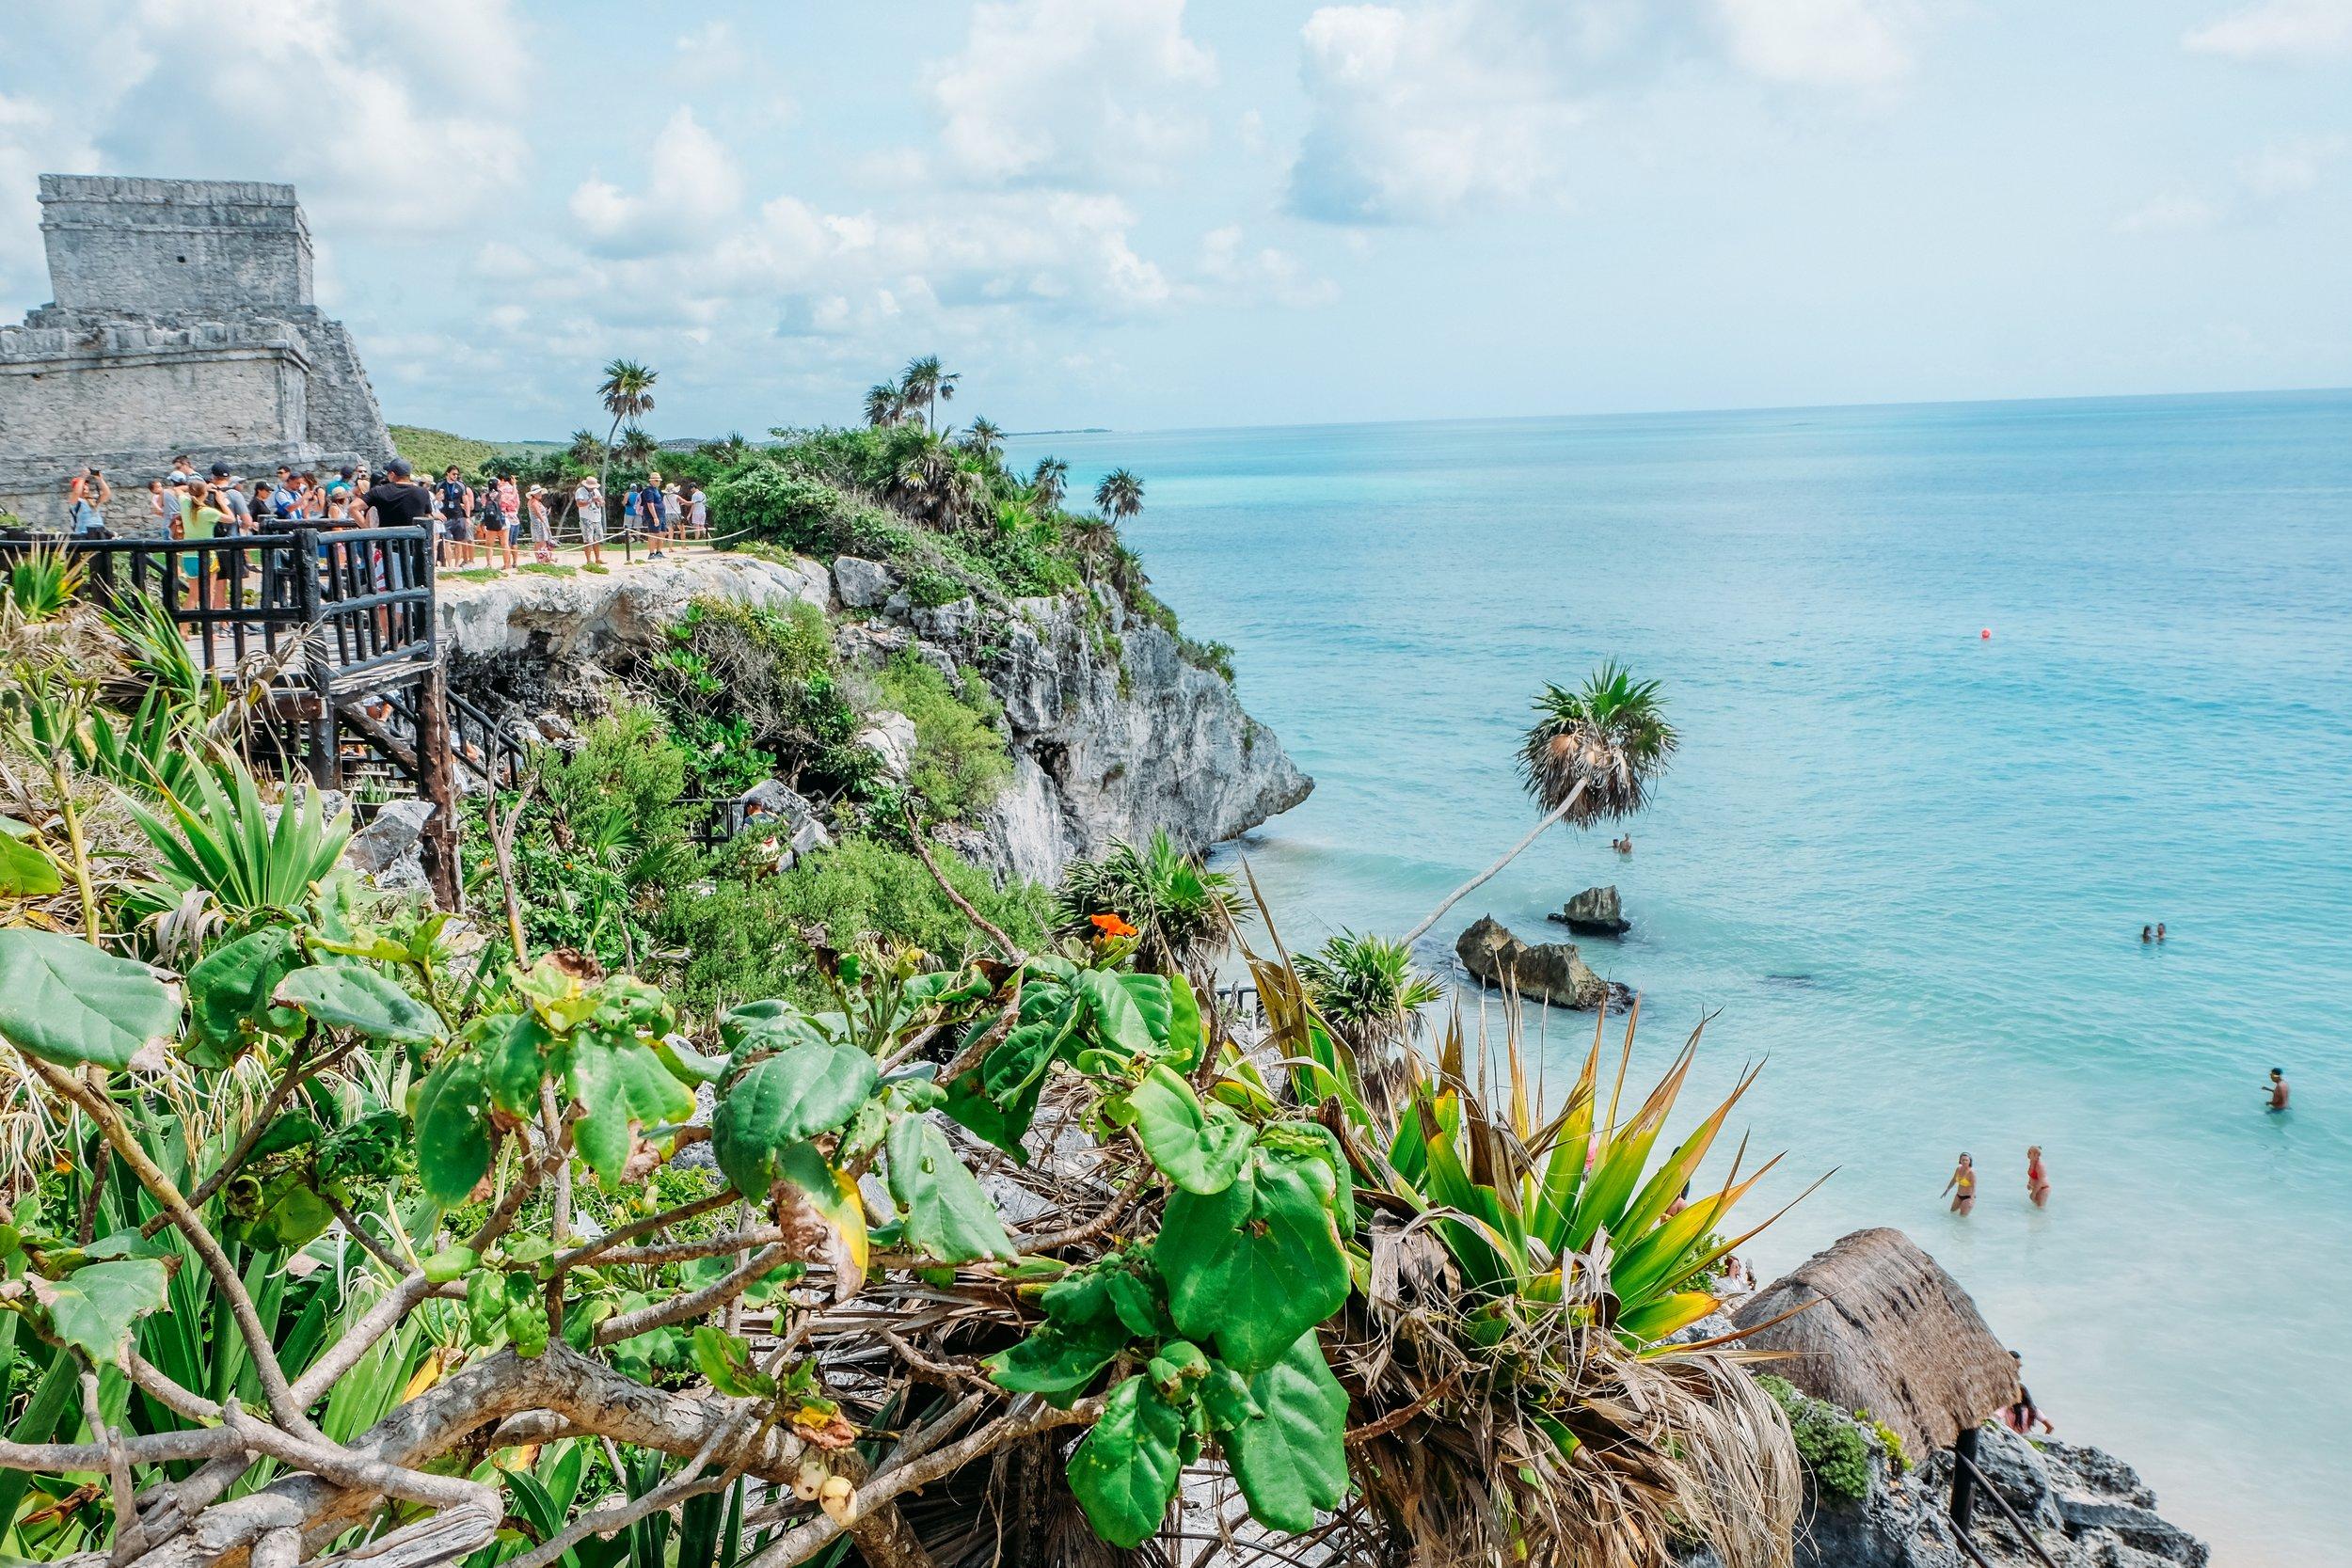 travel-tropical-tulum-tulum-ruins_t20_eoz0Bo.jpg